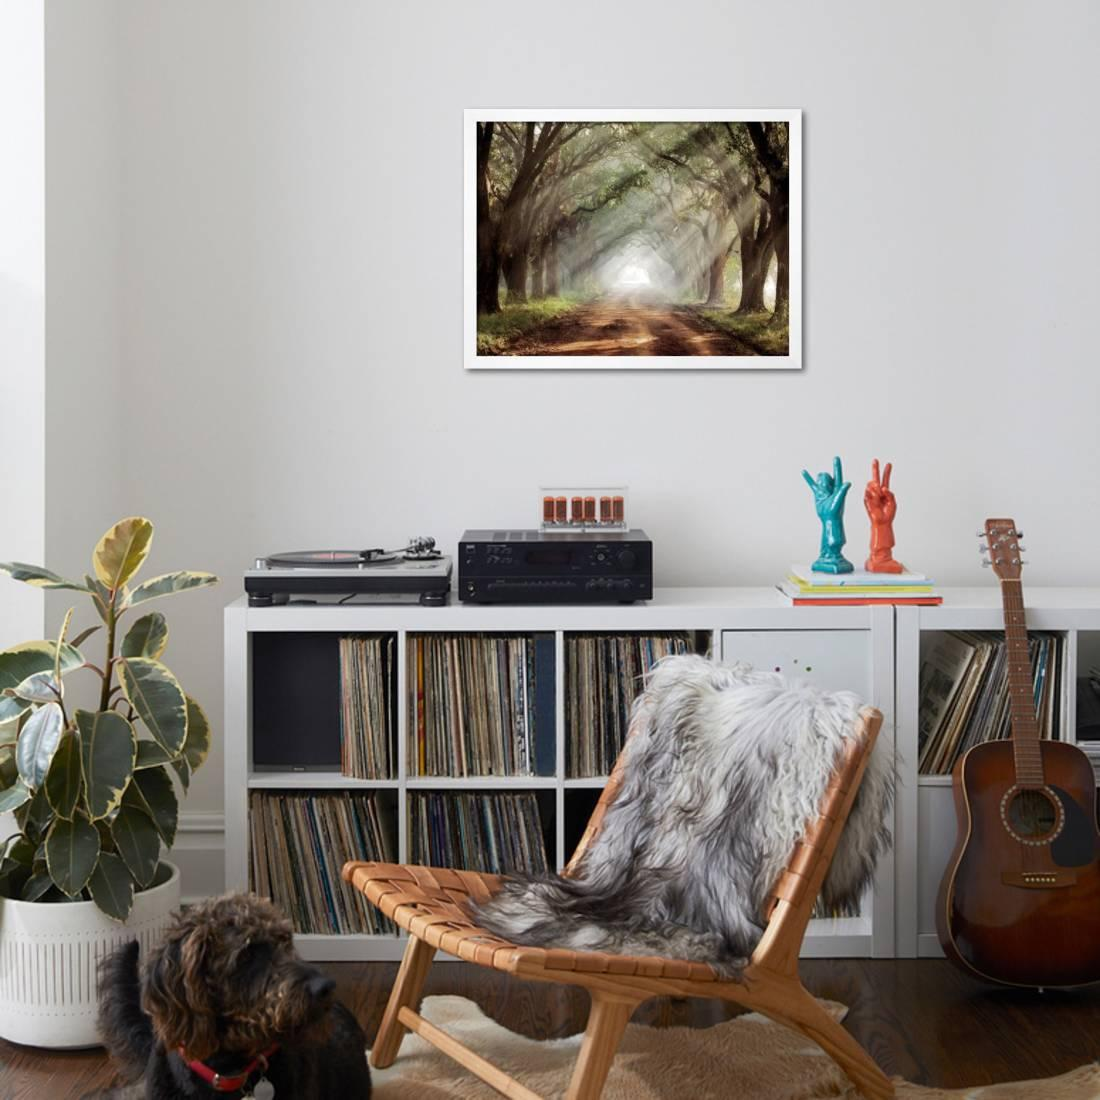 Evergreen Plantation Framed Print Wall Art By Mike Jones - Walmart.com